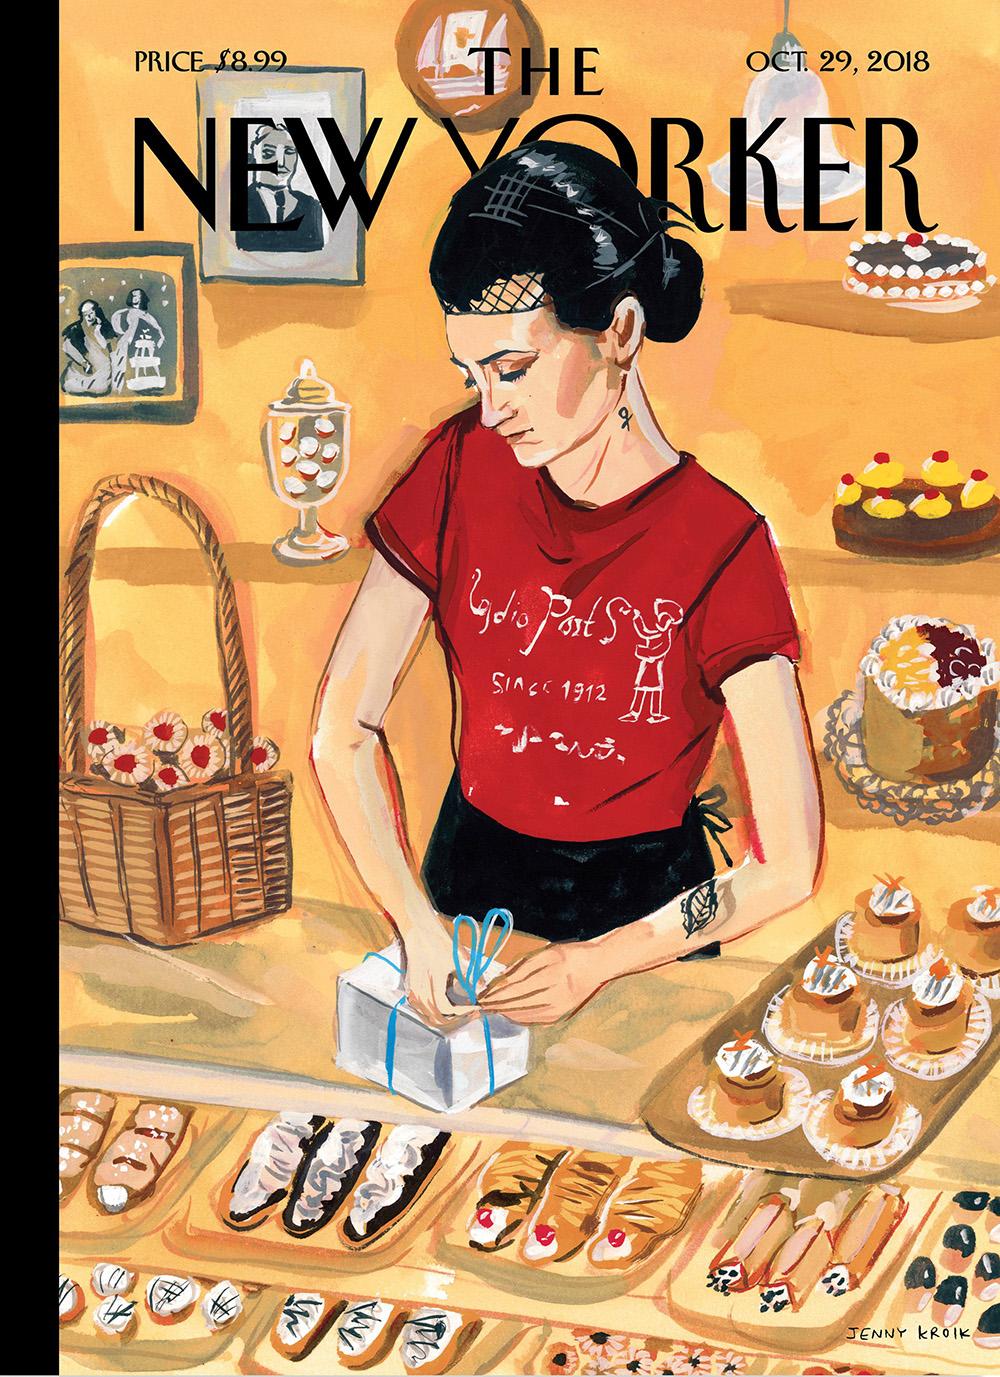 Arthur Ave. (The New Yorker) – Jenny Kroik